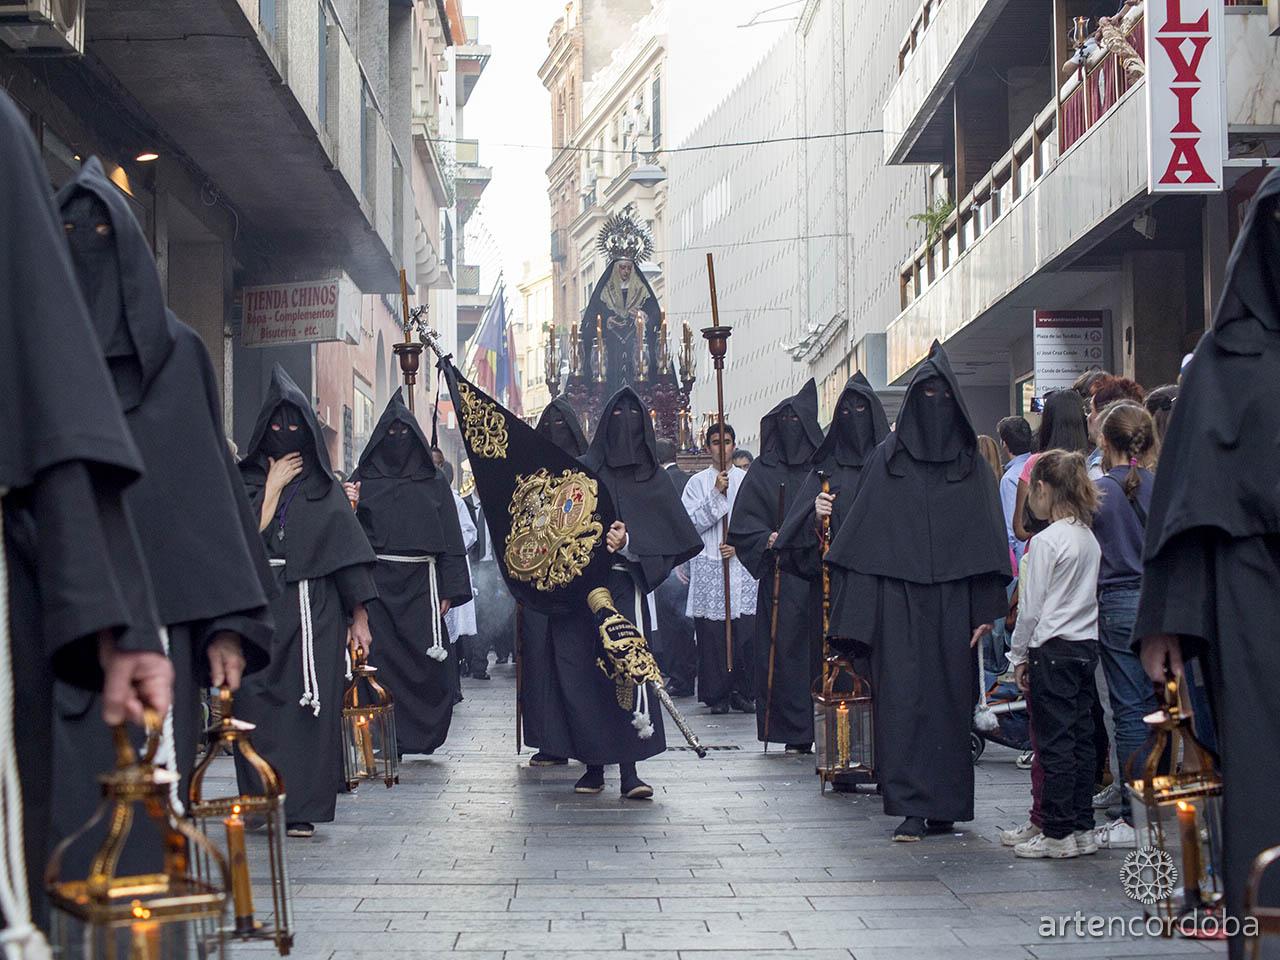 La Hermandad Universitaria luce un peculiar hábito nazareno - Semana Santa de Córdoba